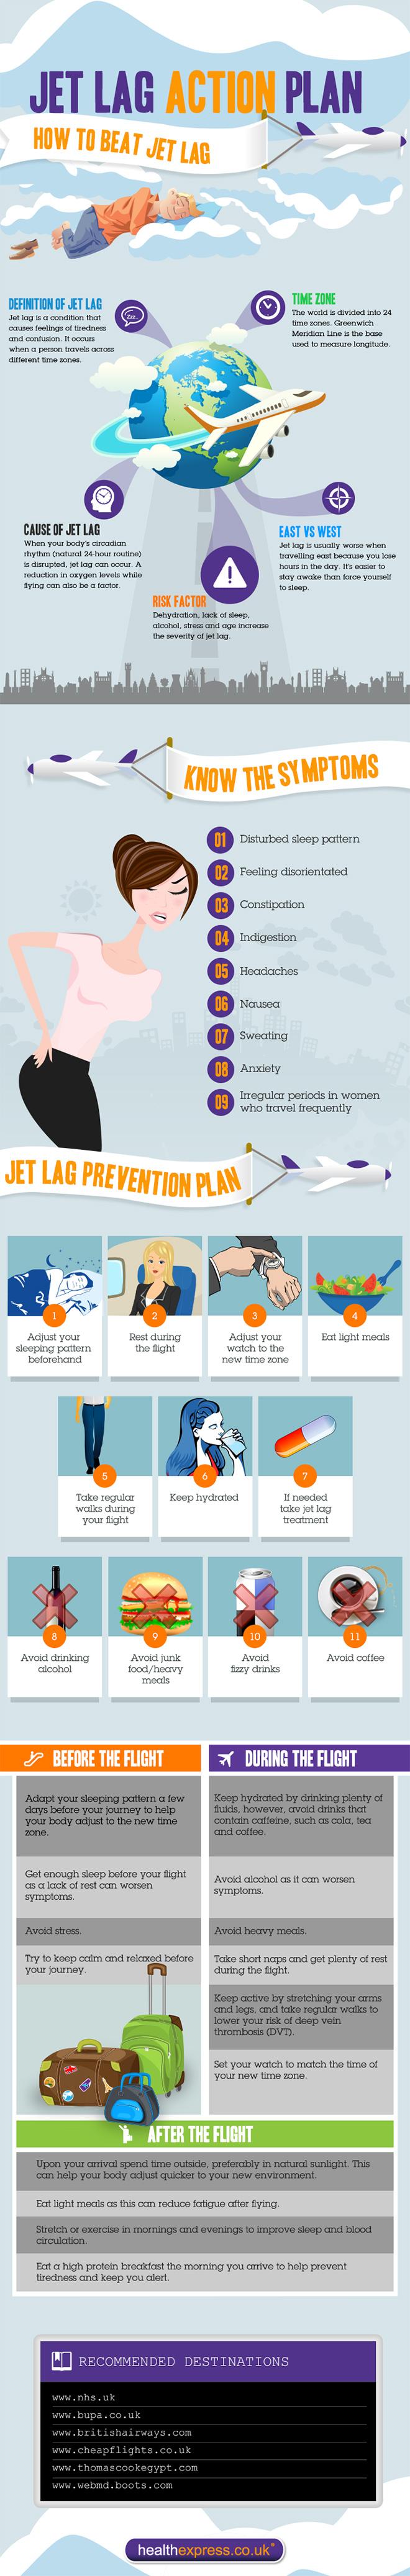 Cómo prevenir el Jet Lag